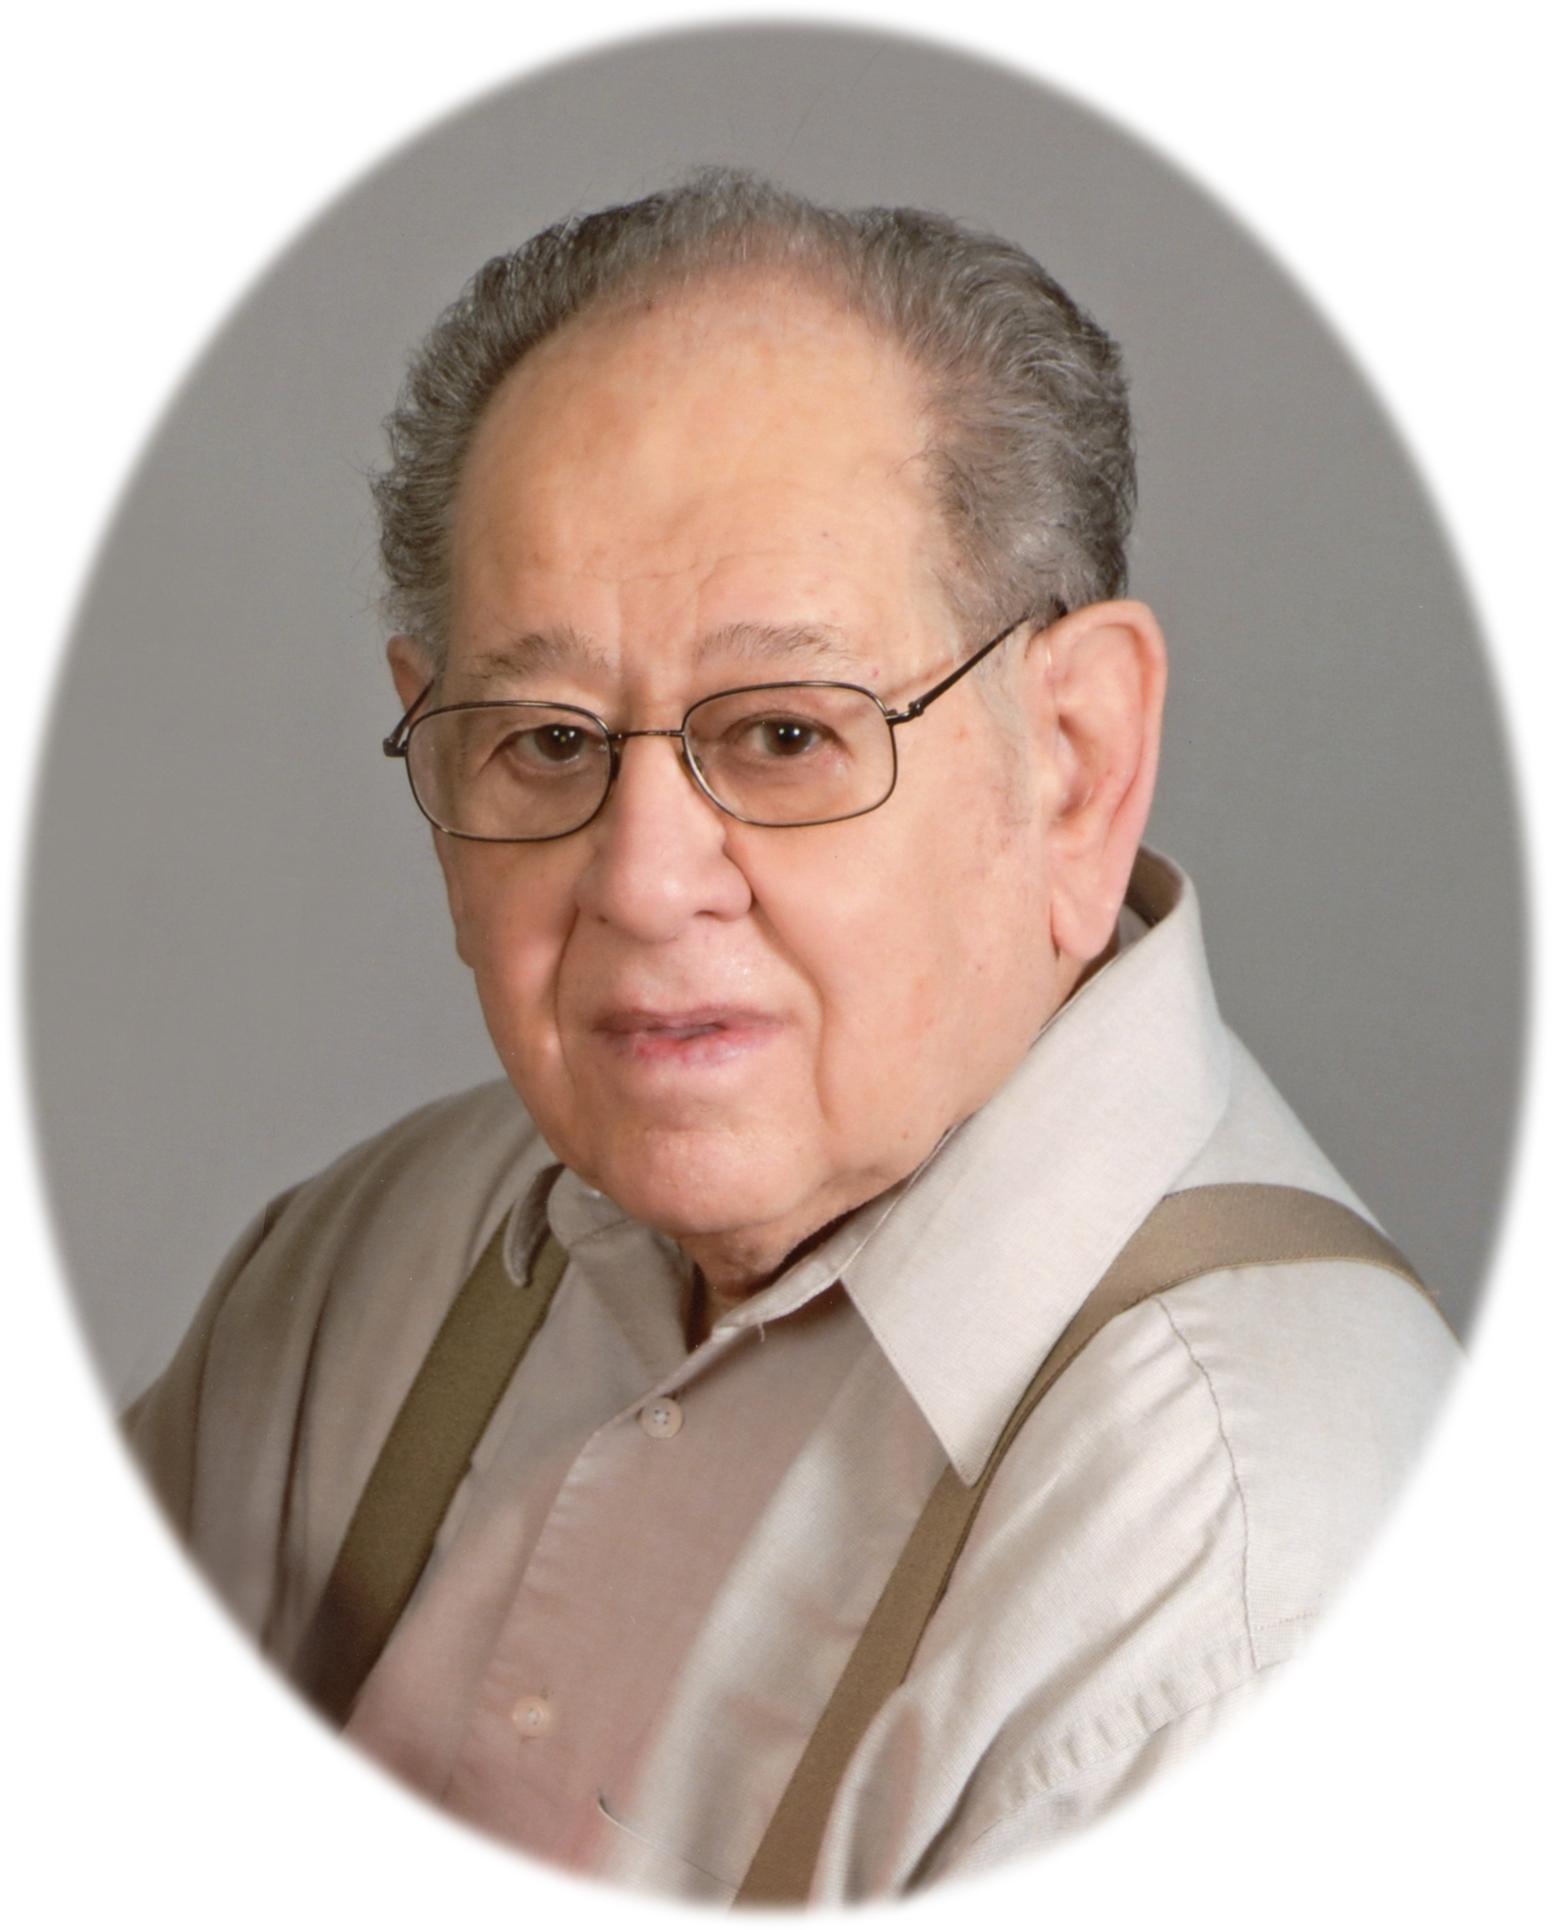 Joseph J. Grasso